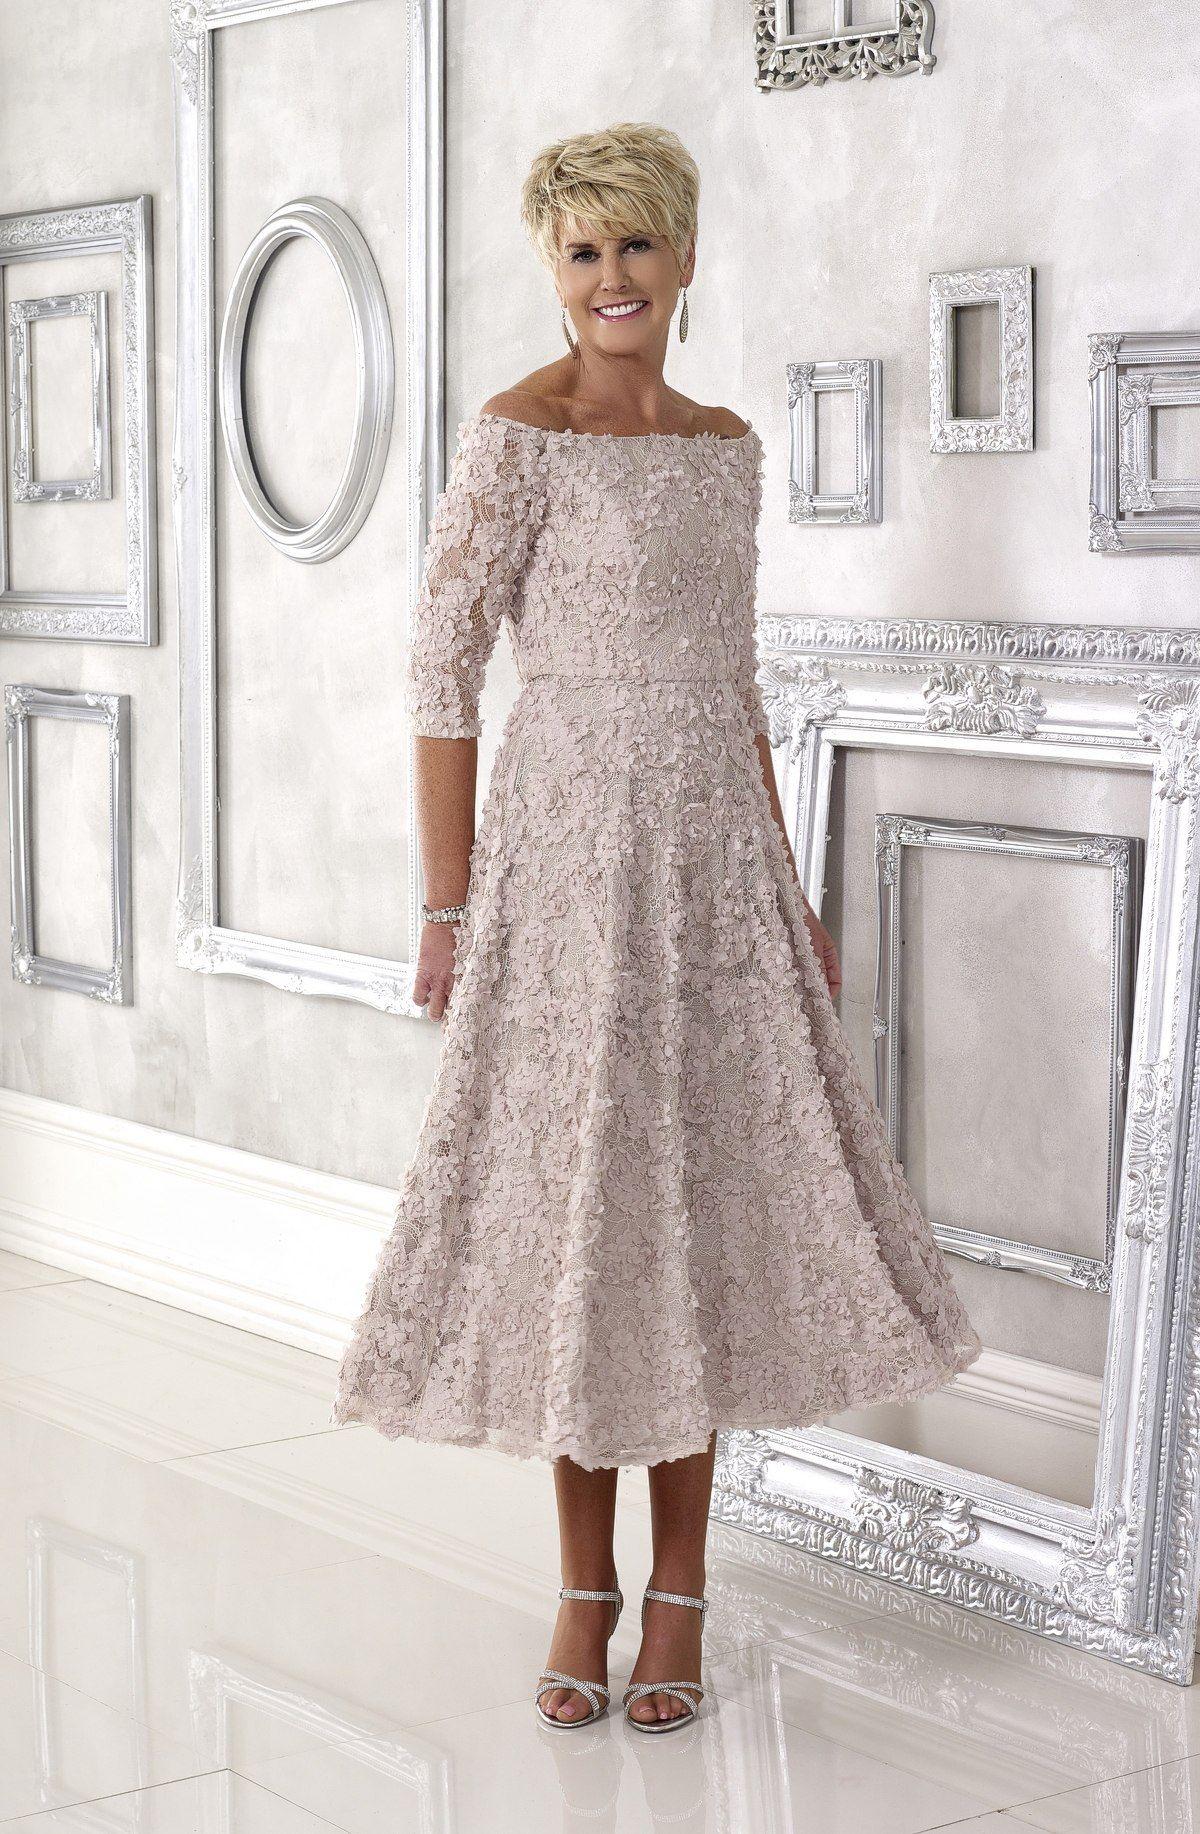 Dressini | Dress Code Mother of the Bride